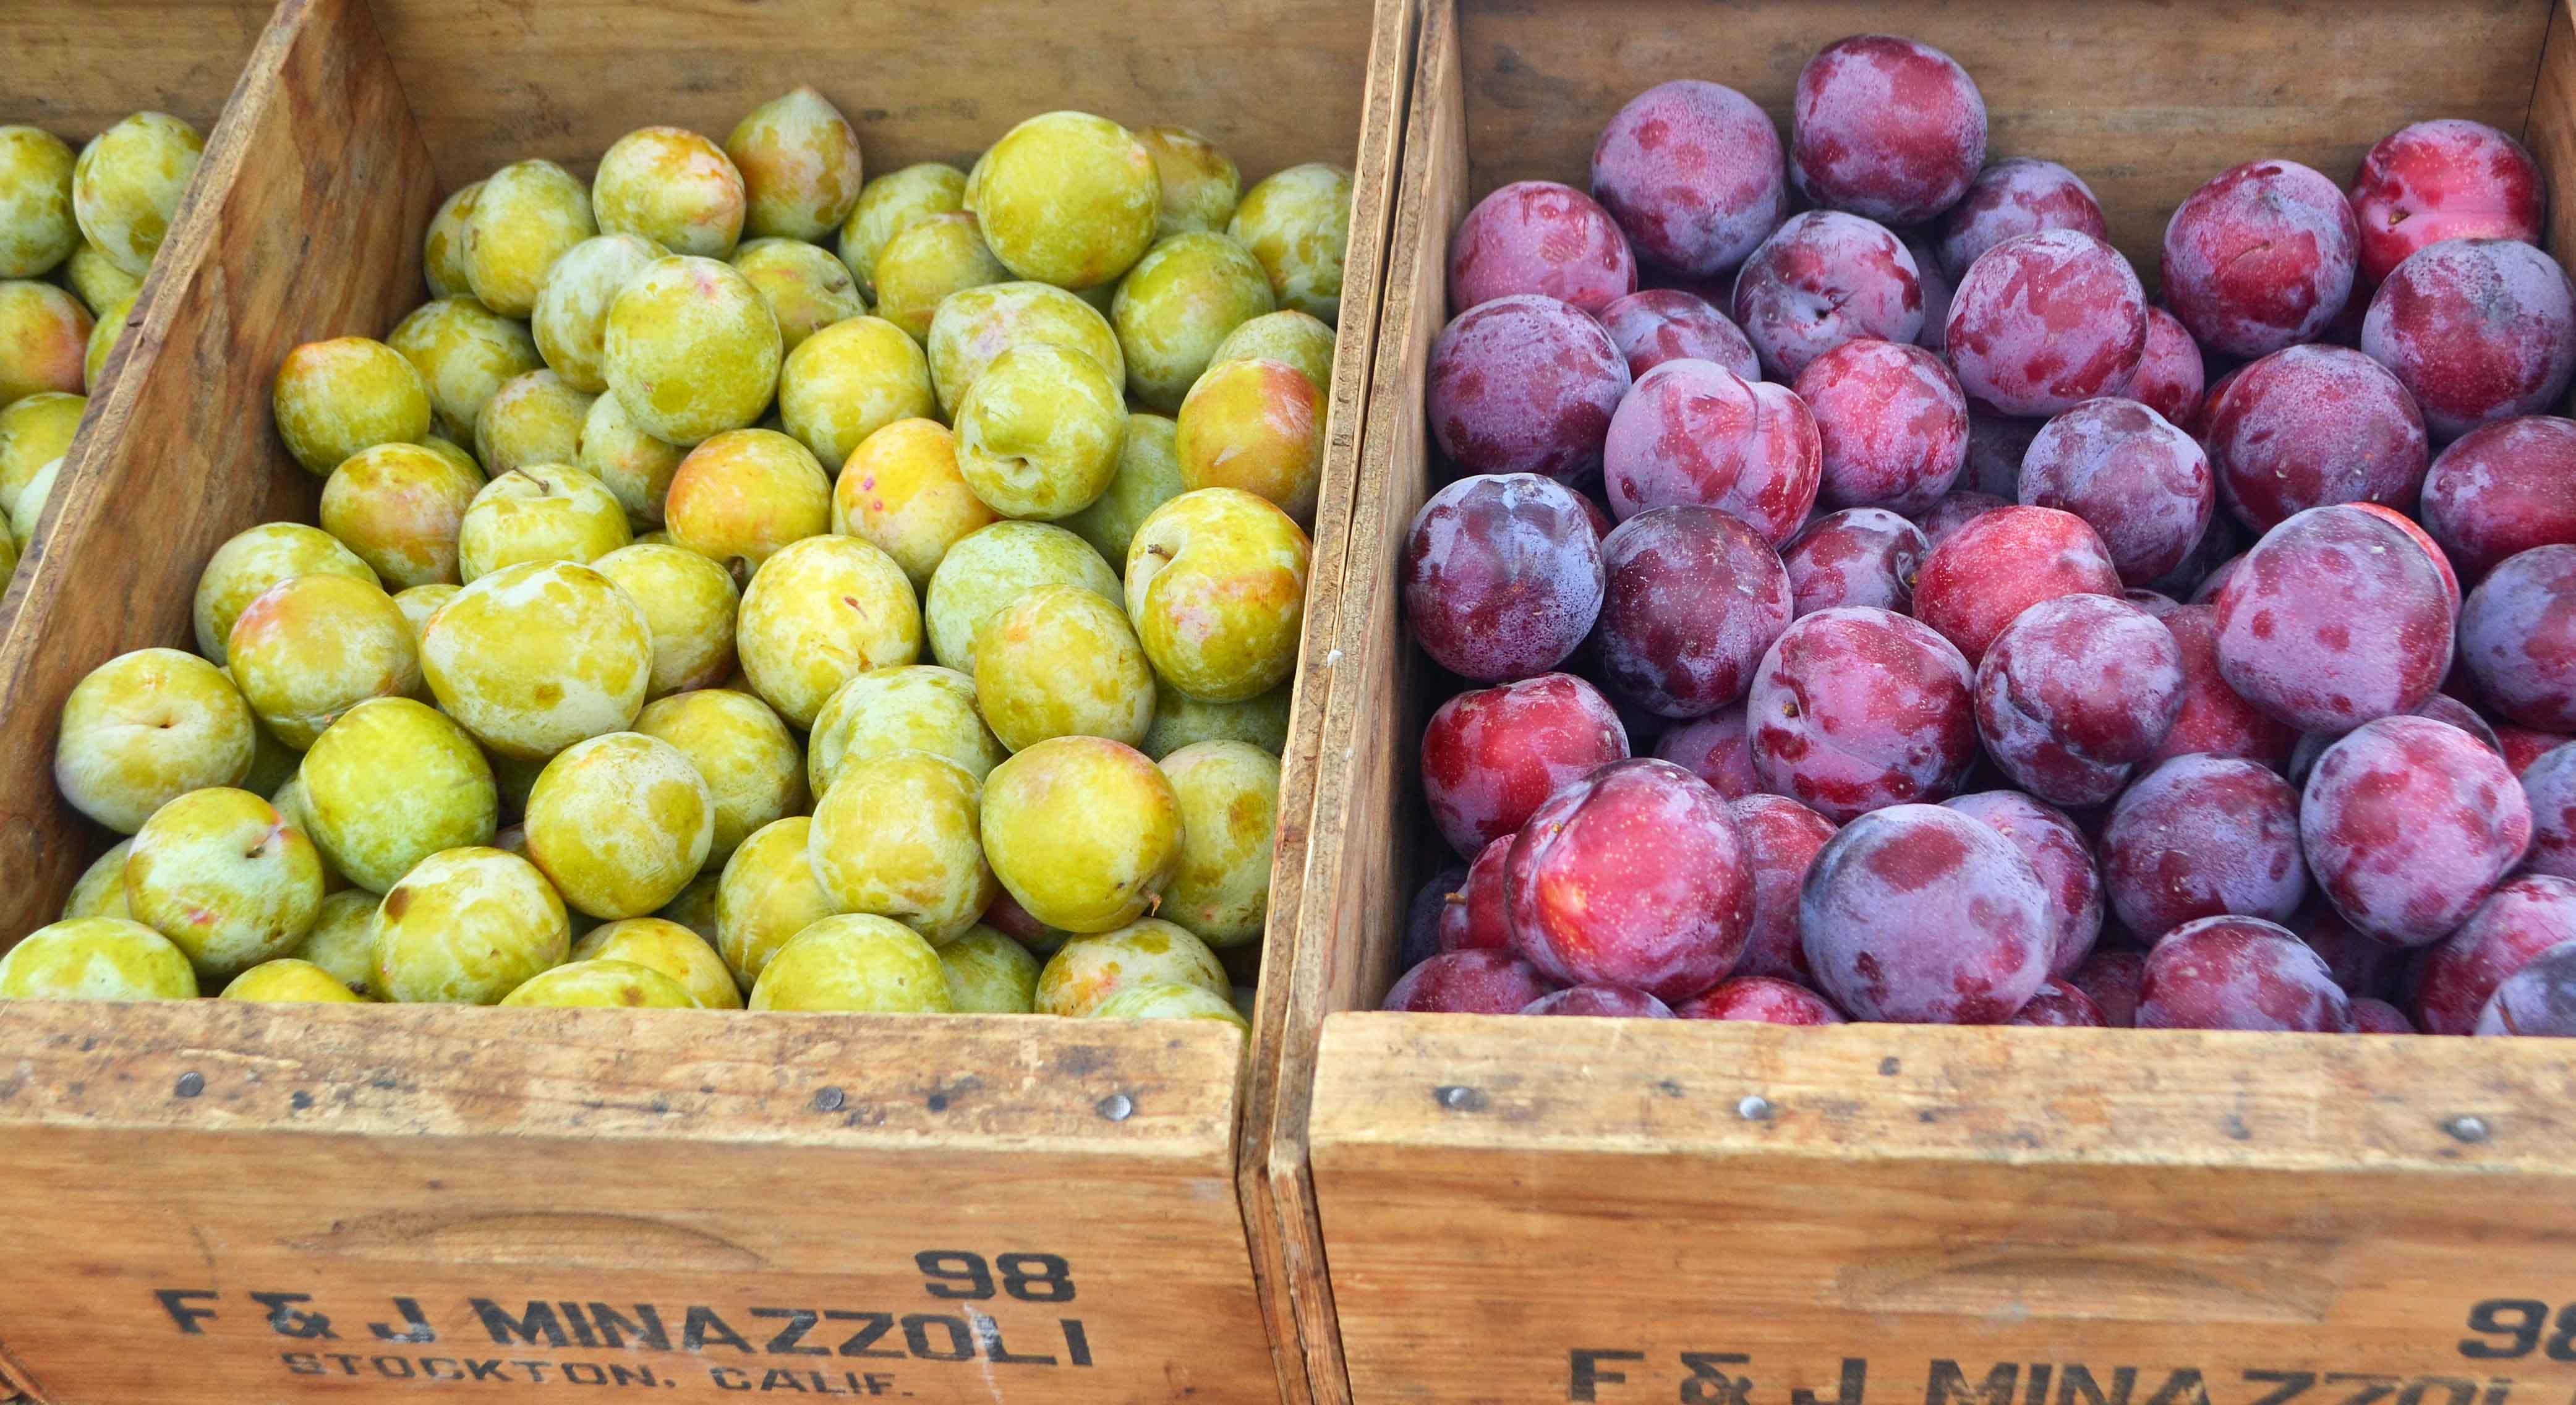 California Pacific Coast Highway 1 Road Trip Guide -- Farmer's Markets